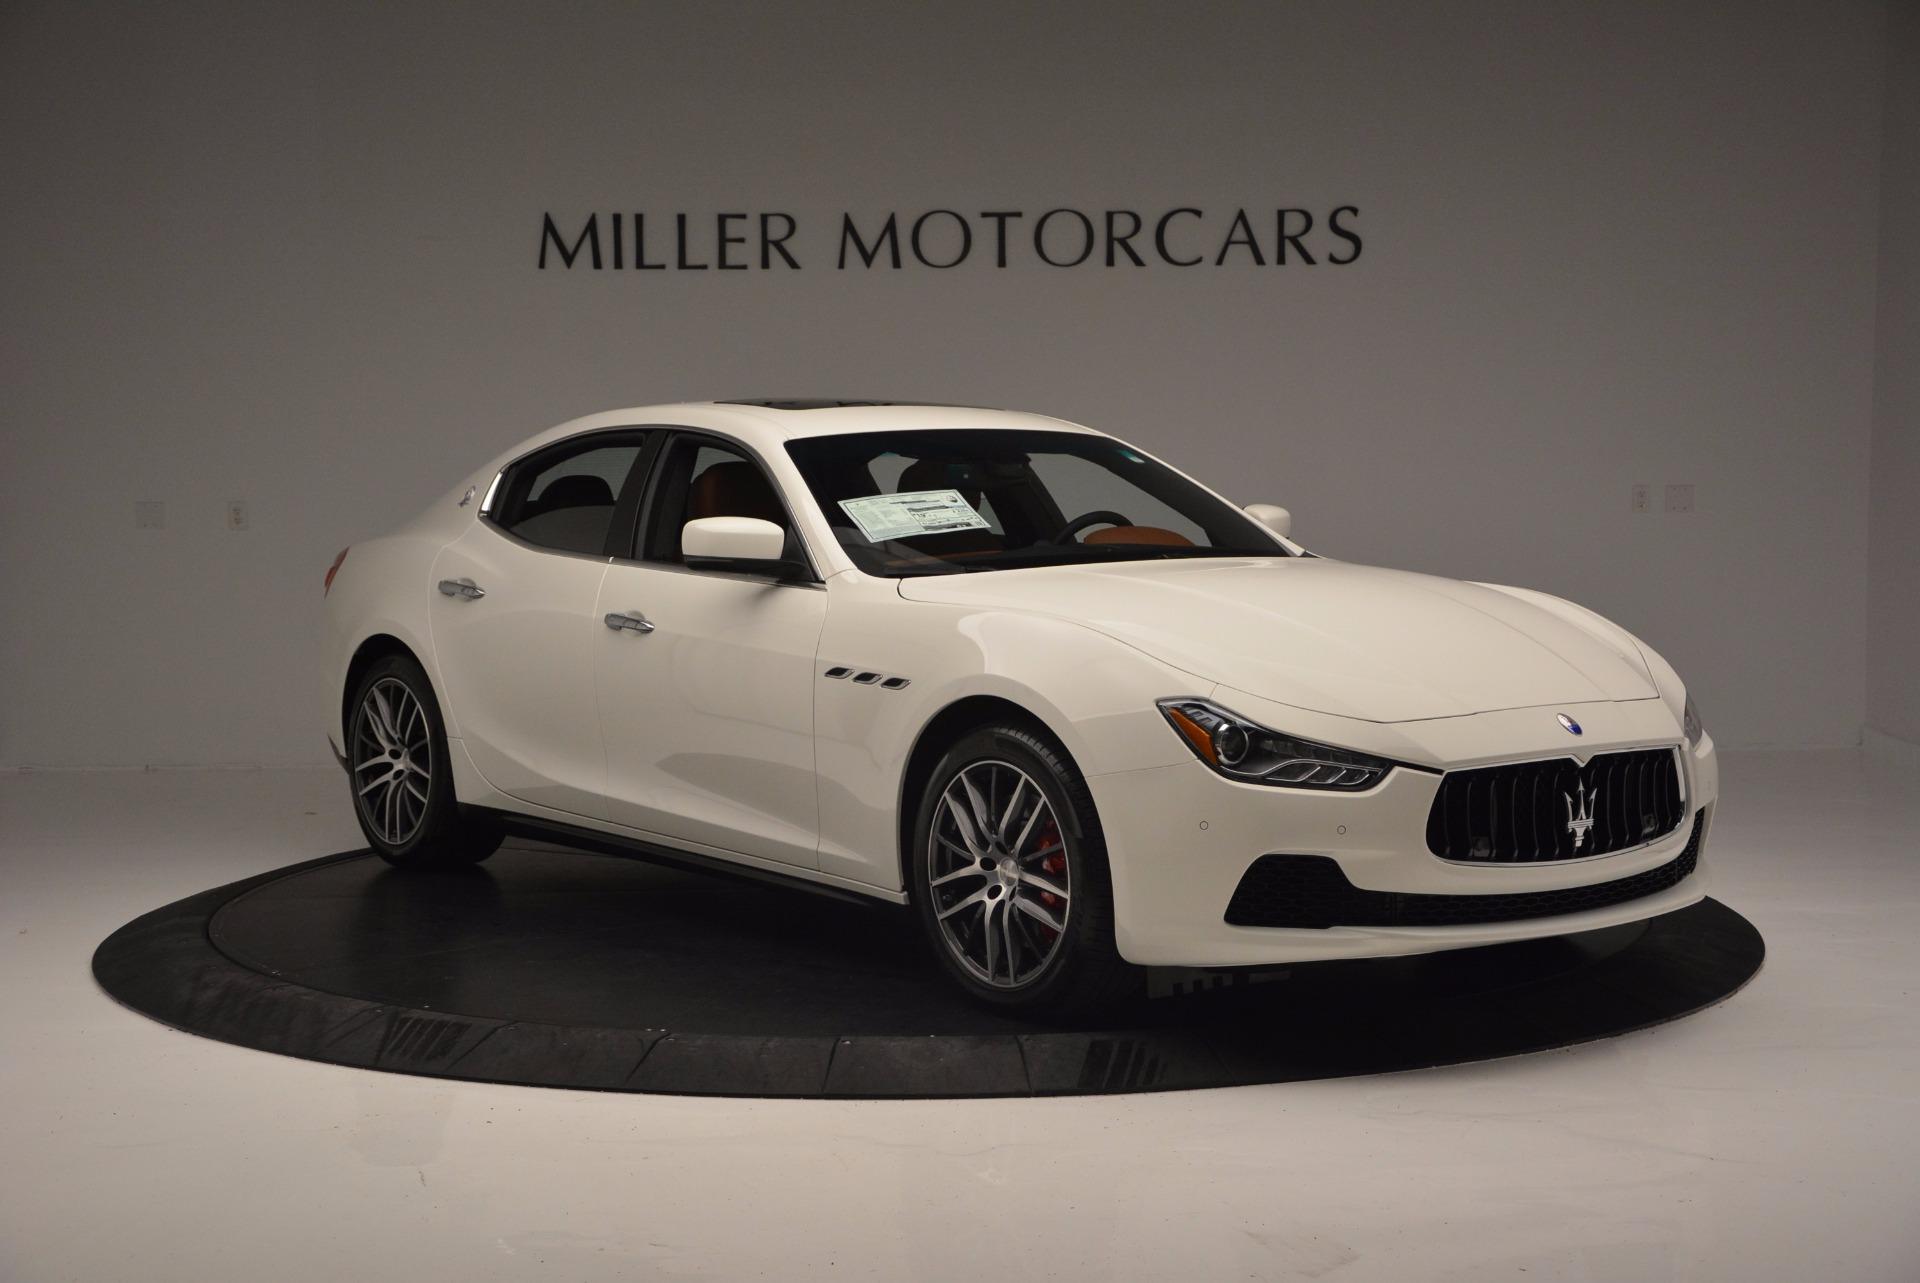 Used 2017 Maserati Ghibli S Q4 Ex-Loaner For Sale In Greenwich, CT 1166_p11